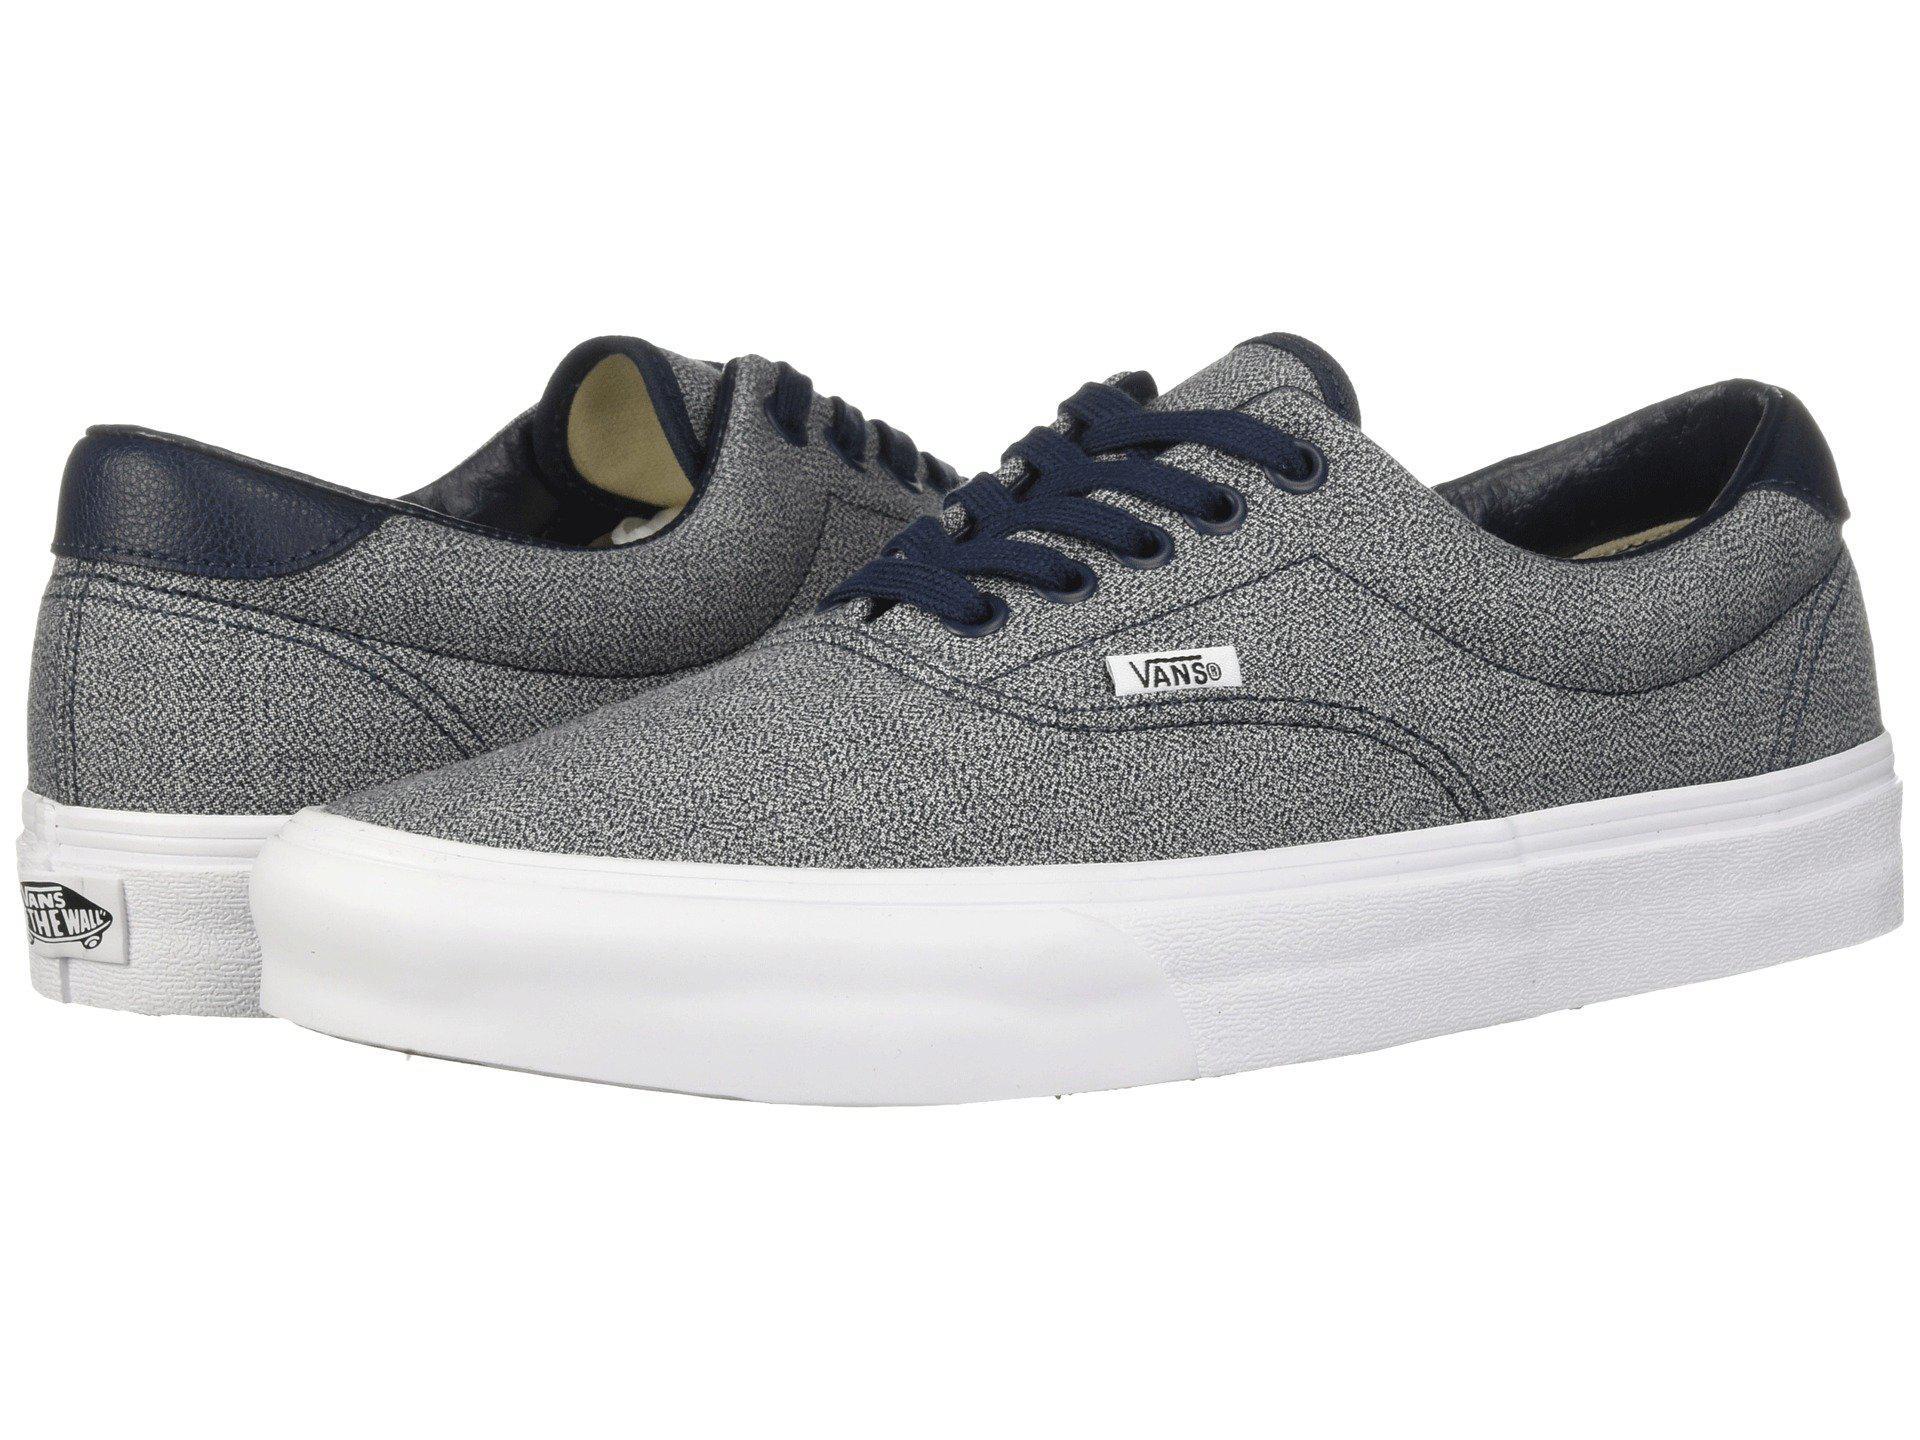 74afa23b48 Lyst - Vans Era 59 ((c l) Frost Gray acid Denim) Skate Shoes for Men